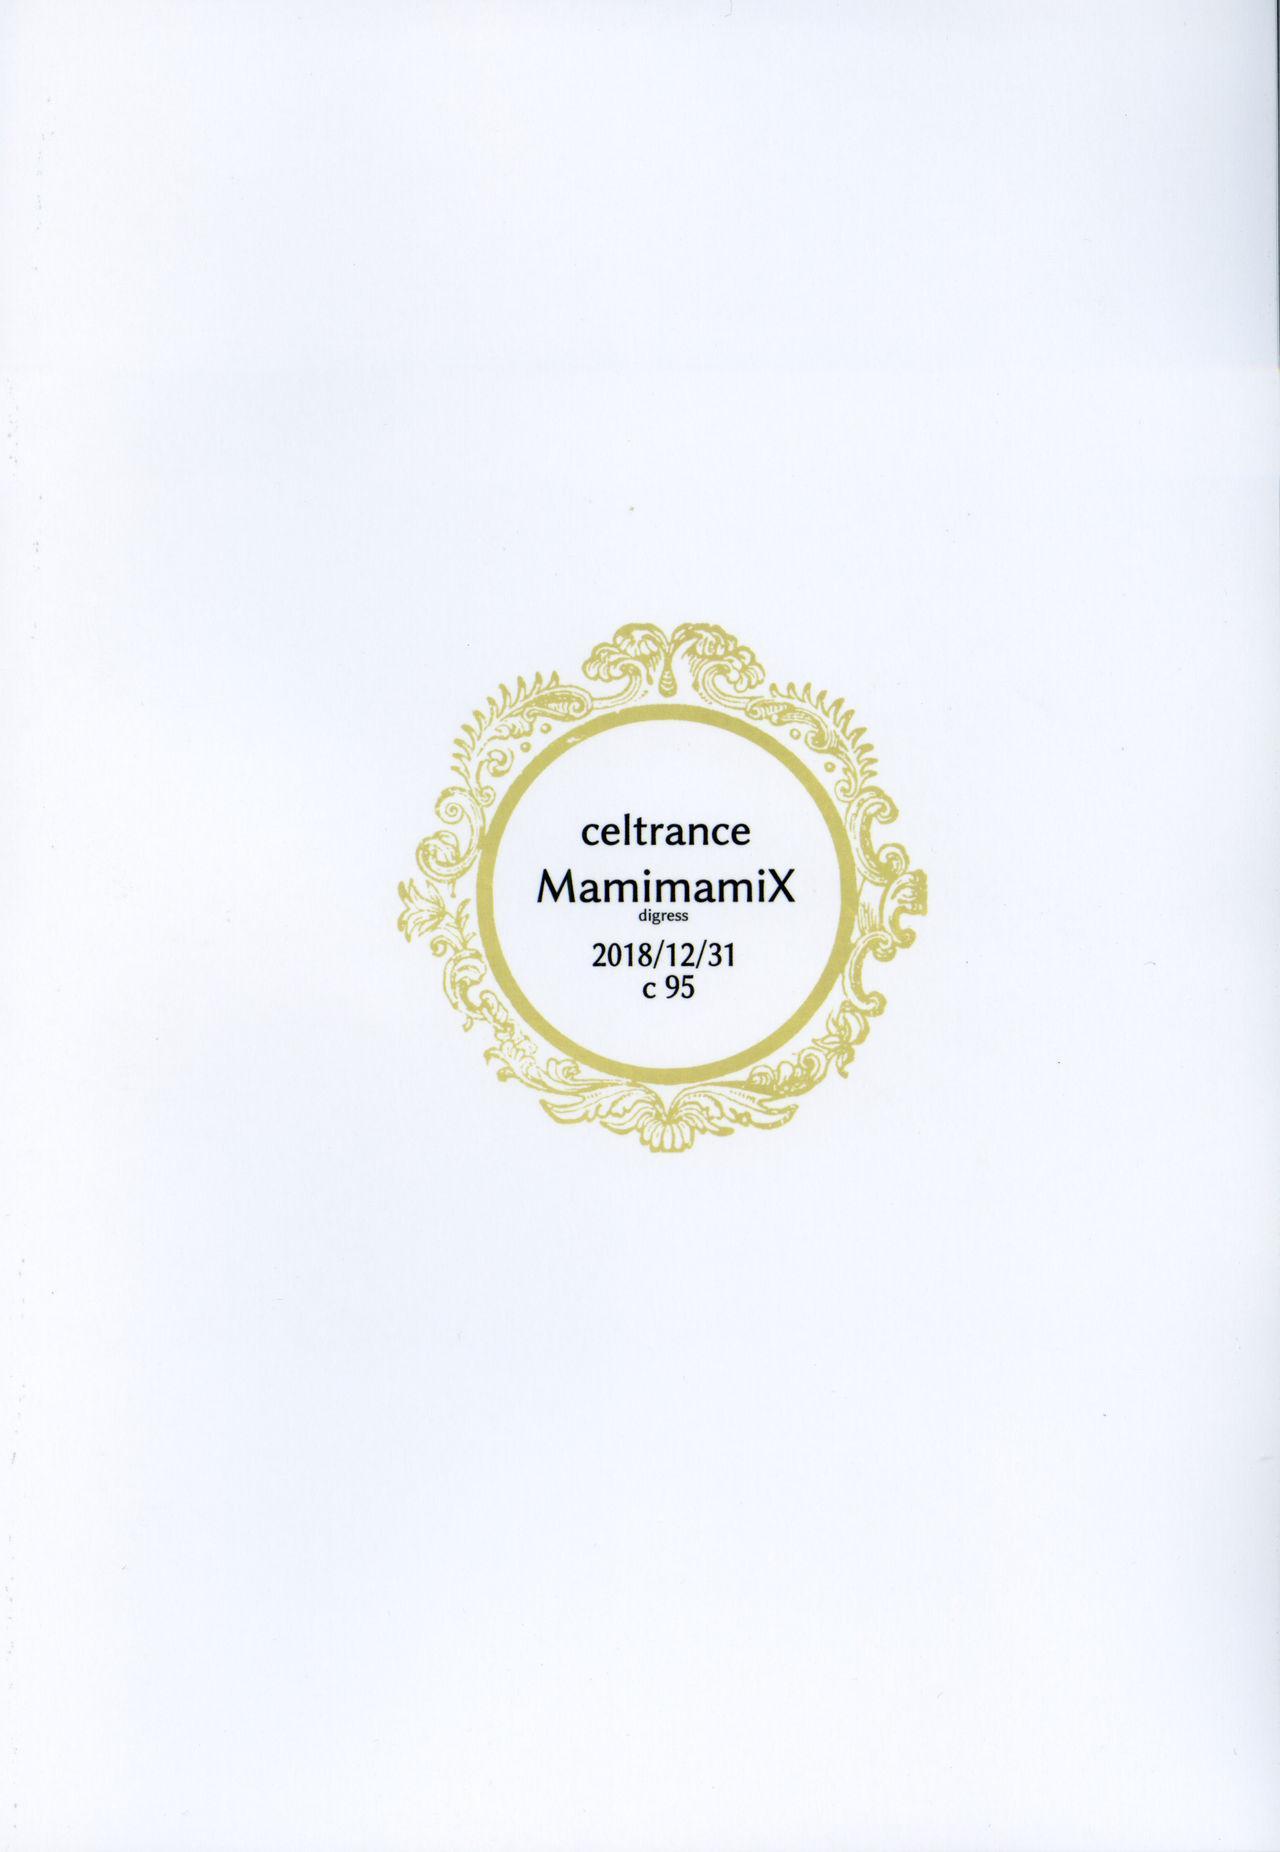 MamimamiX digress 25